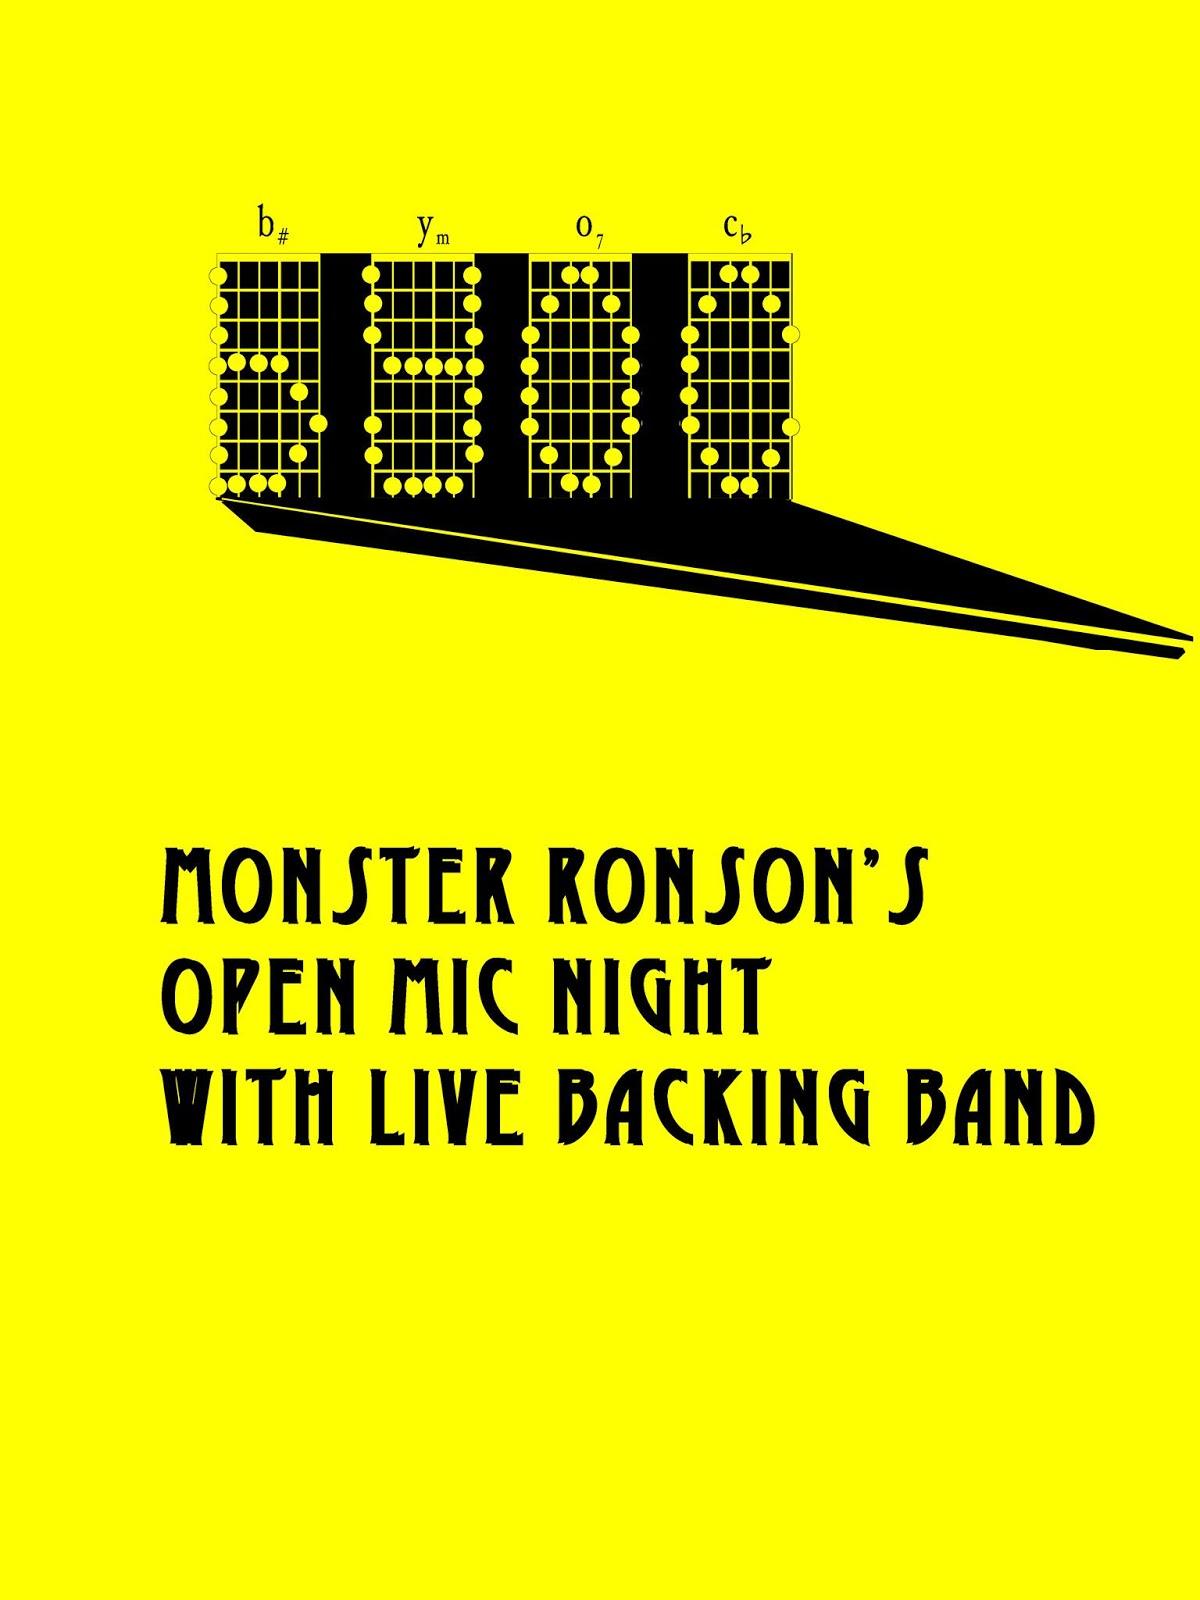 Monster Ronsons Ichiban Karaoke Byoc Bring Your Own Chords